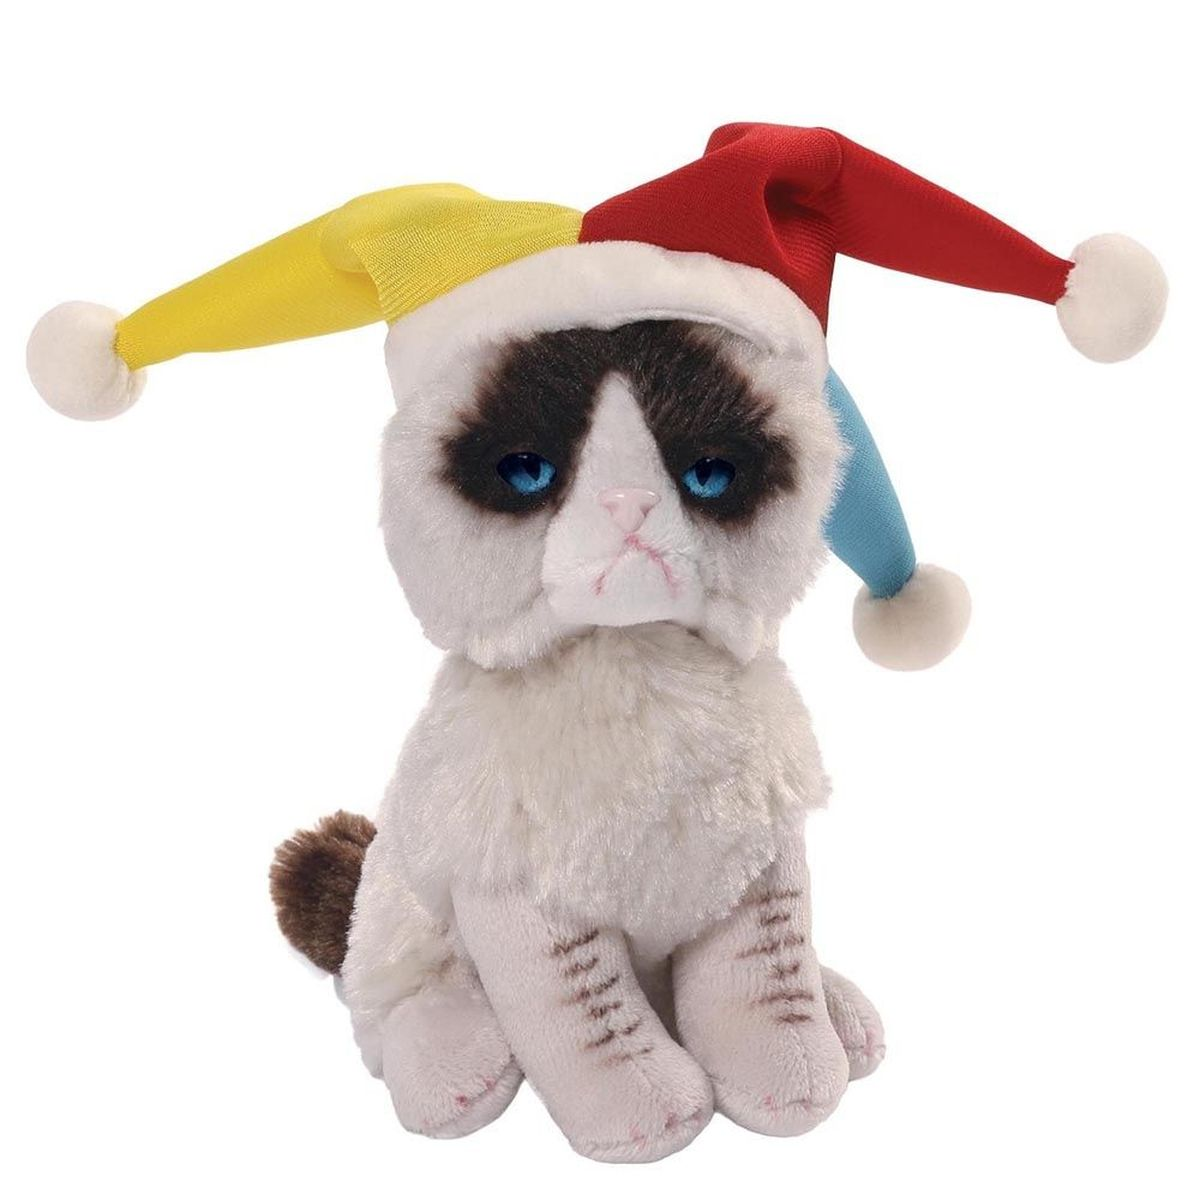 Gund Мягкая игрушка Grumpy Cat Jester 12,5 см gund мягкая игрушка grumpy cat 23 см